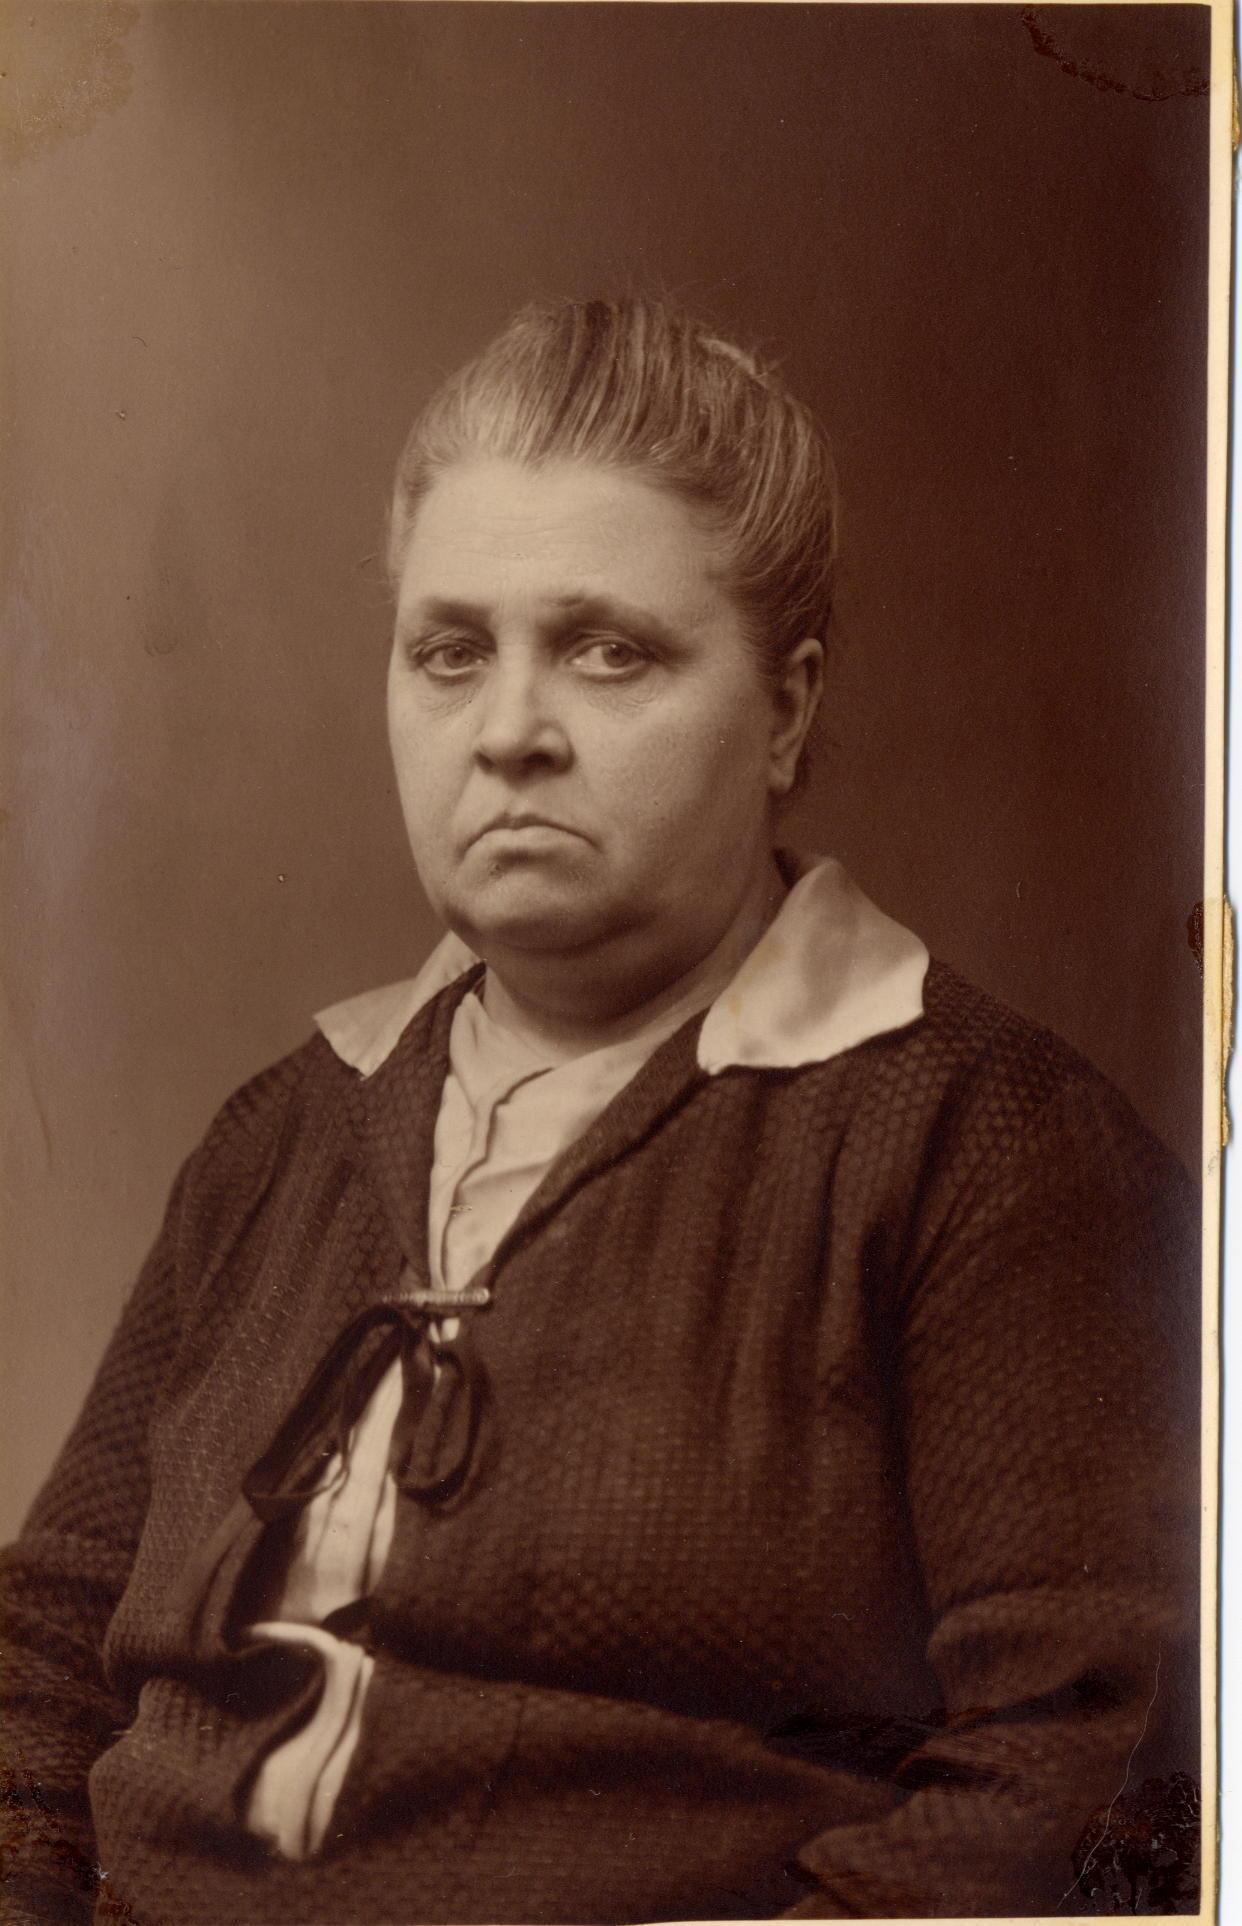 Geertruida Elisabeth van Vessem (1875-1939)